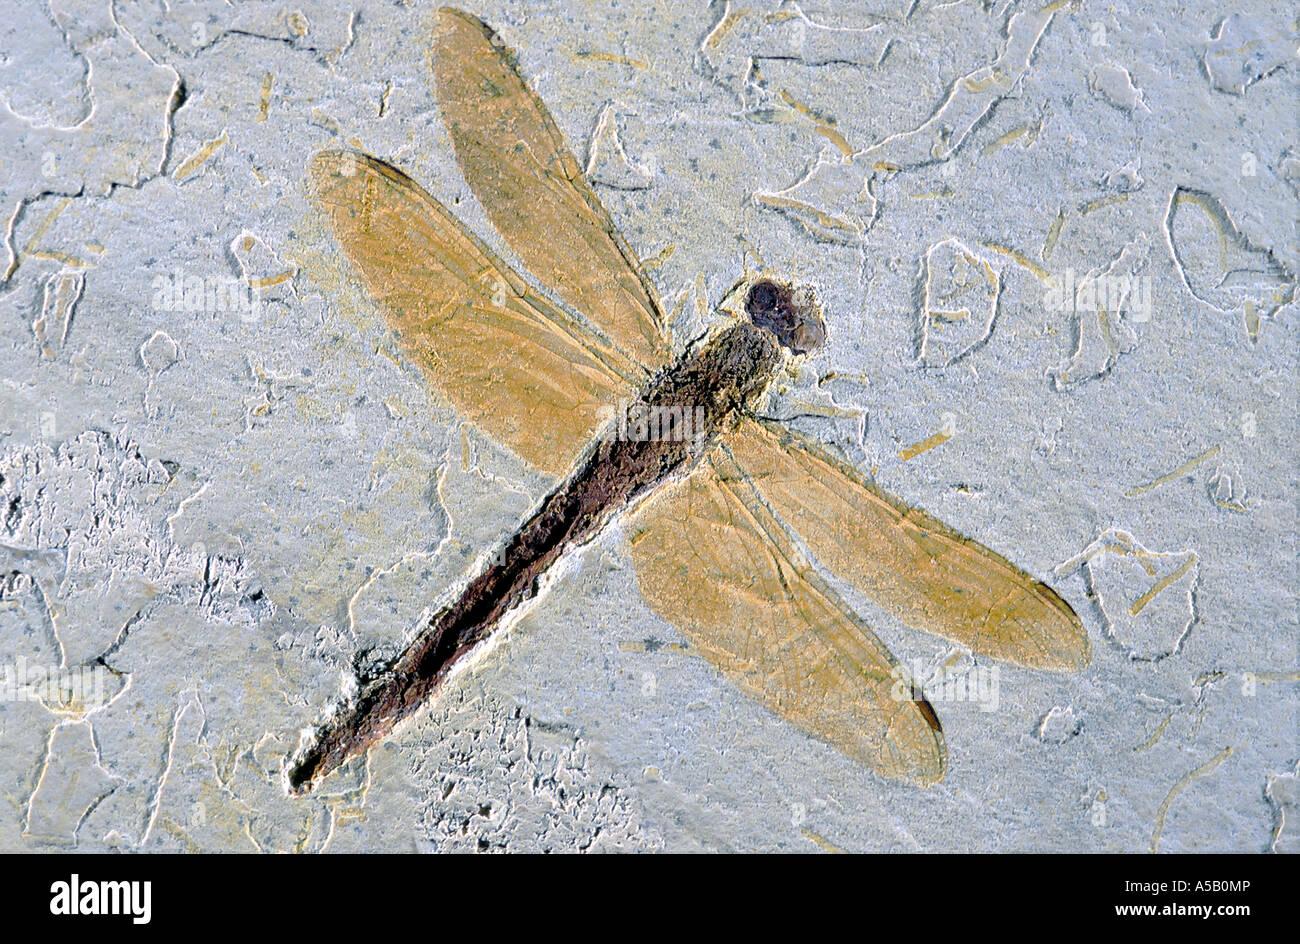 Dragonfly Fossil Wightonia araripiana Lower Cretaceous Brazil - Stock Image